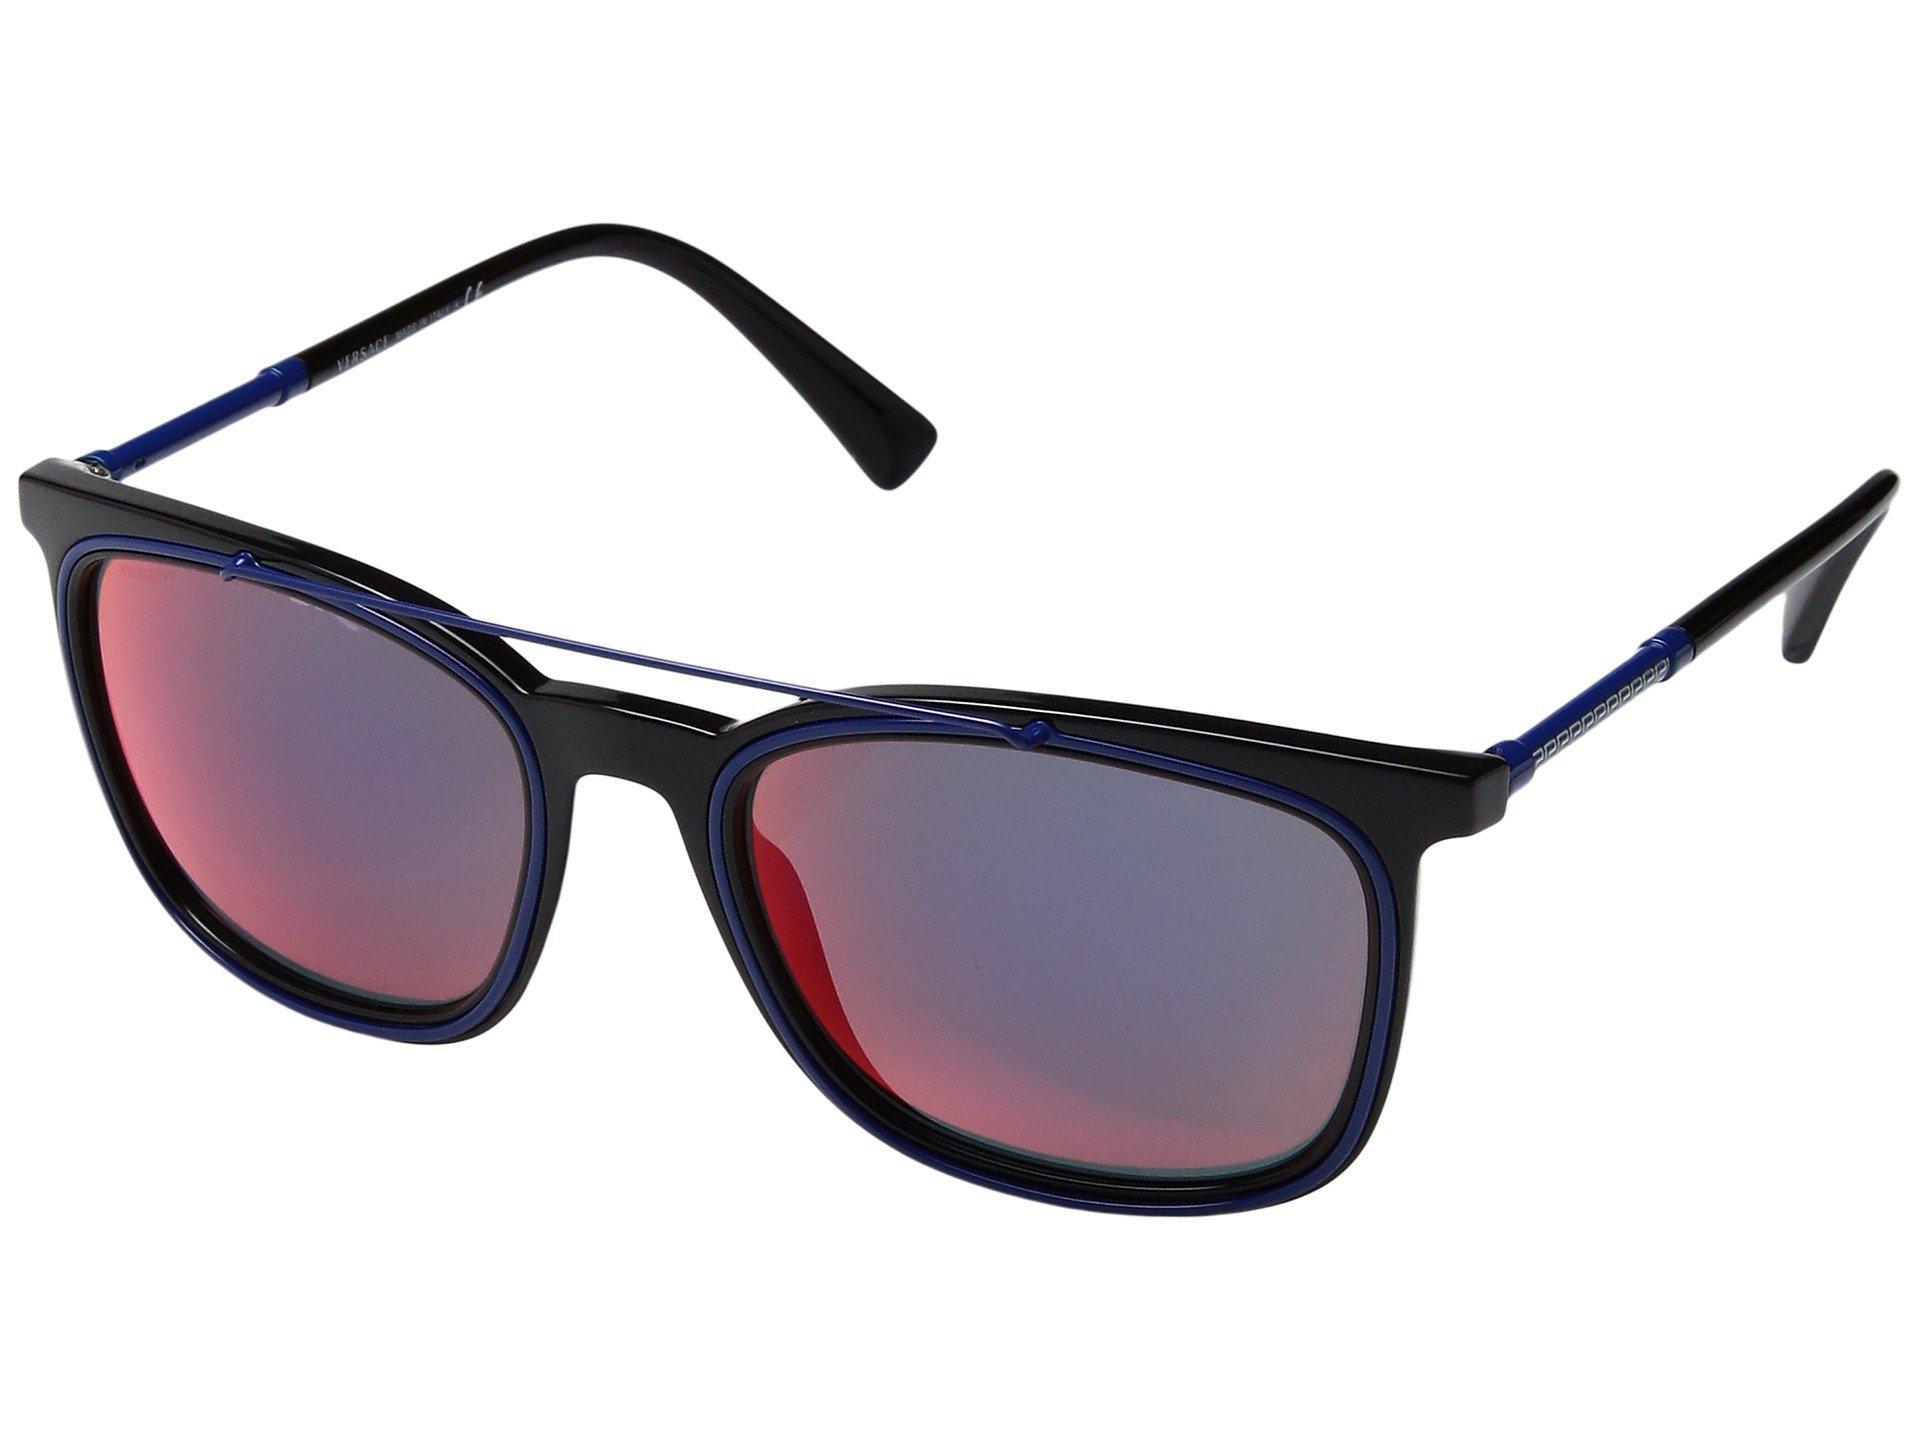 f4ca8ae40a1 Lyst - Versace Ve4335 (black grey Gradient) Fashion Sunglasses in ...